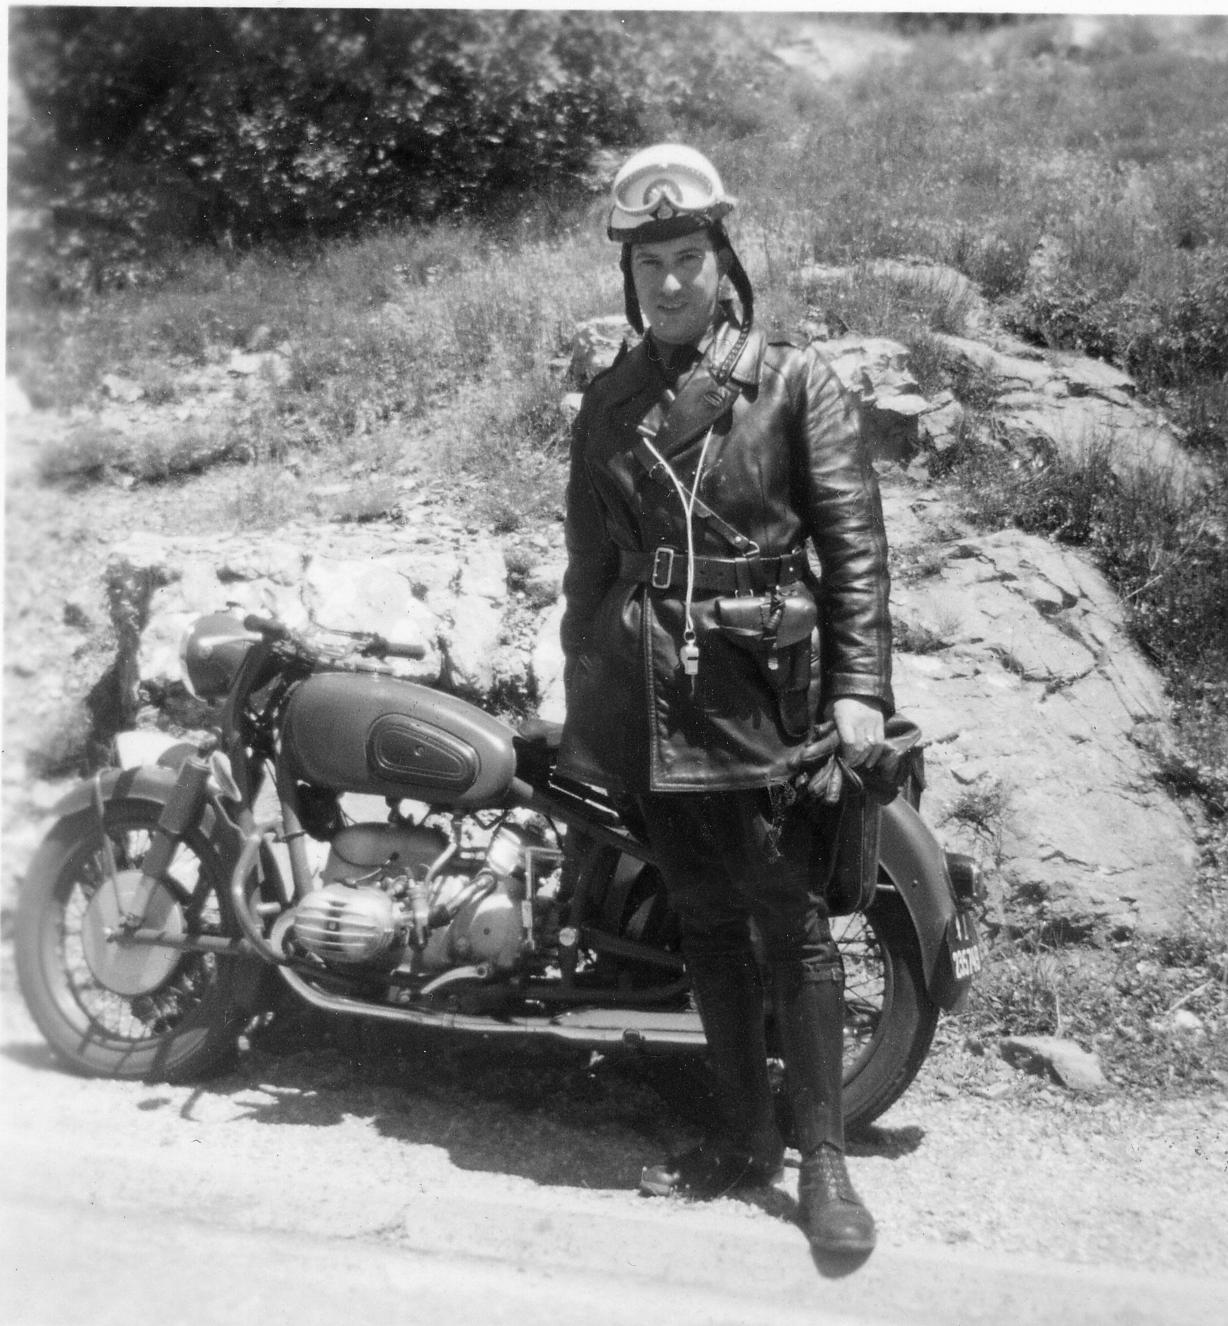 Photos Gendarmerie, BMO de Hyeres  années 1960 843668File0144